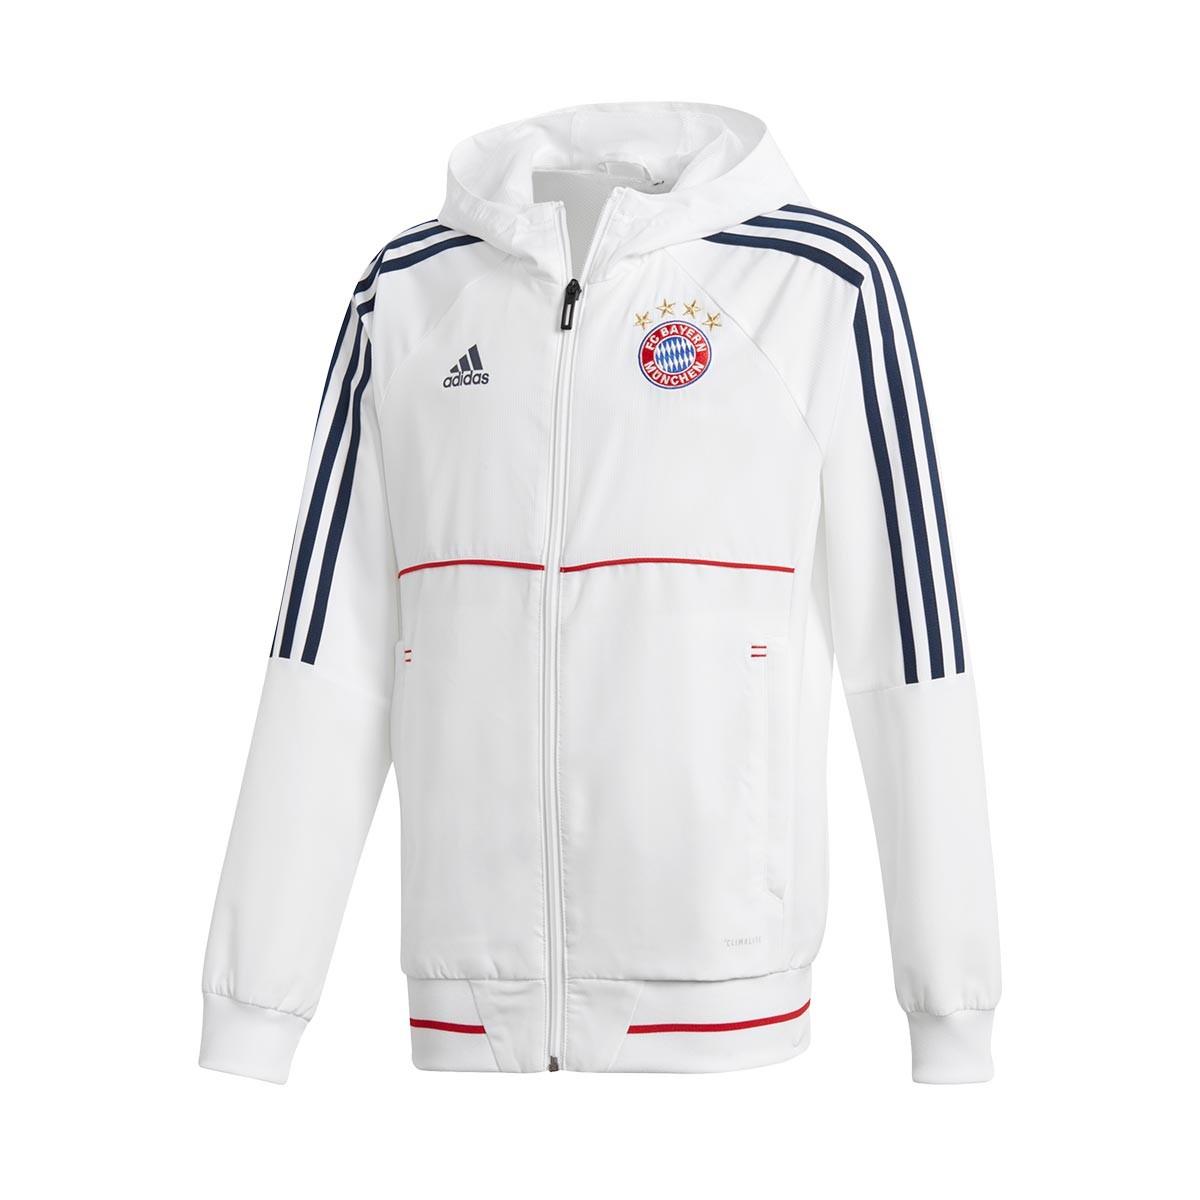 2017 2018 Bayern Pre White Fc Navy Collegiate Munich Match Chaqueta Niño rxBeCdo